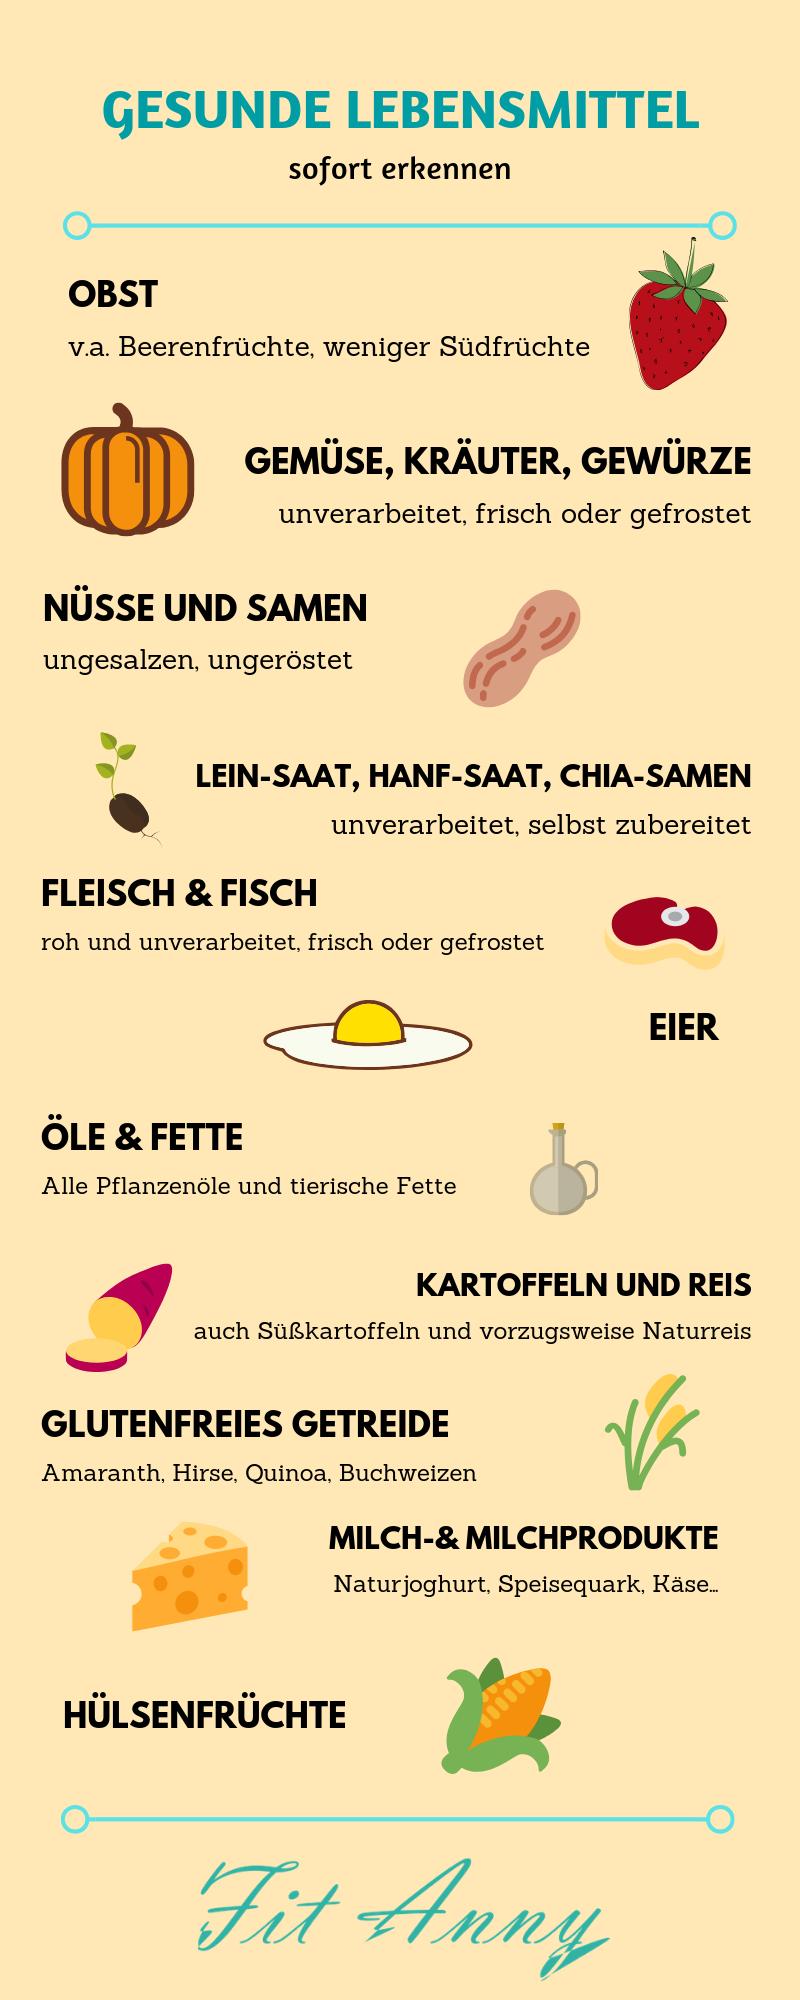 Gesunde Lebensmittel erkennen